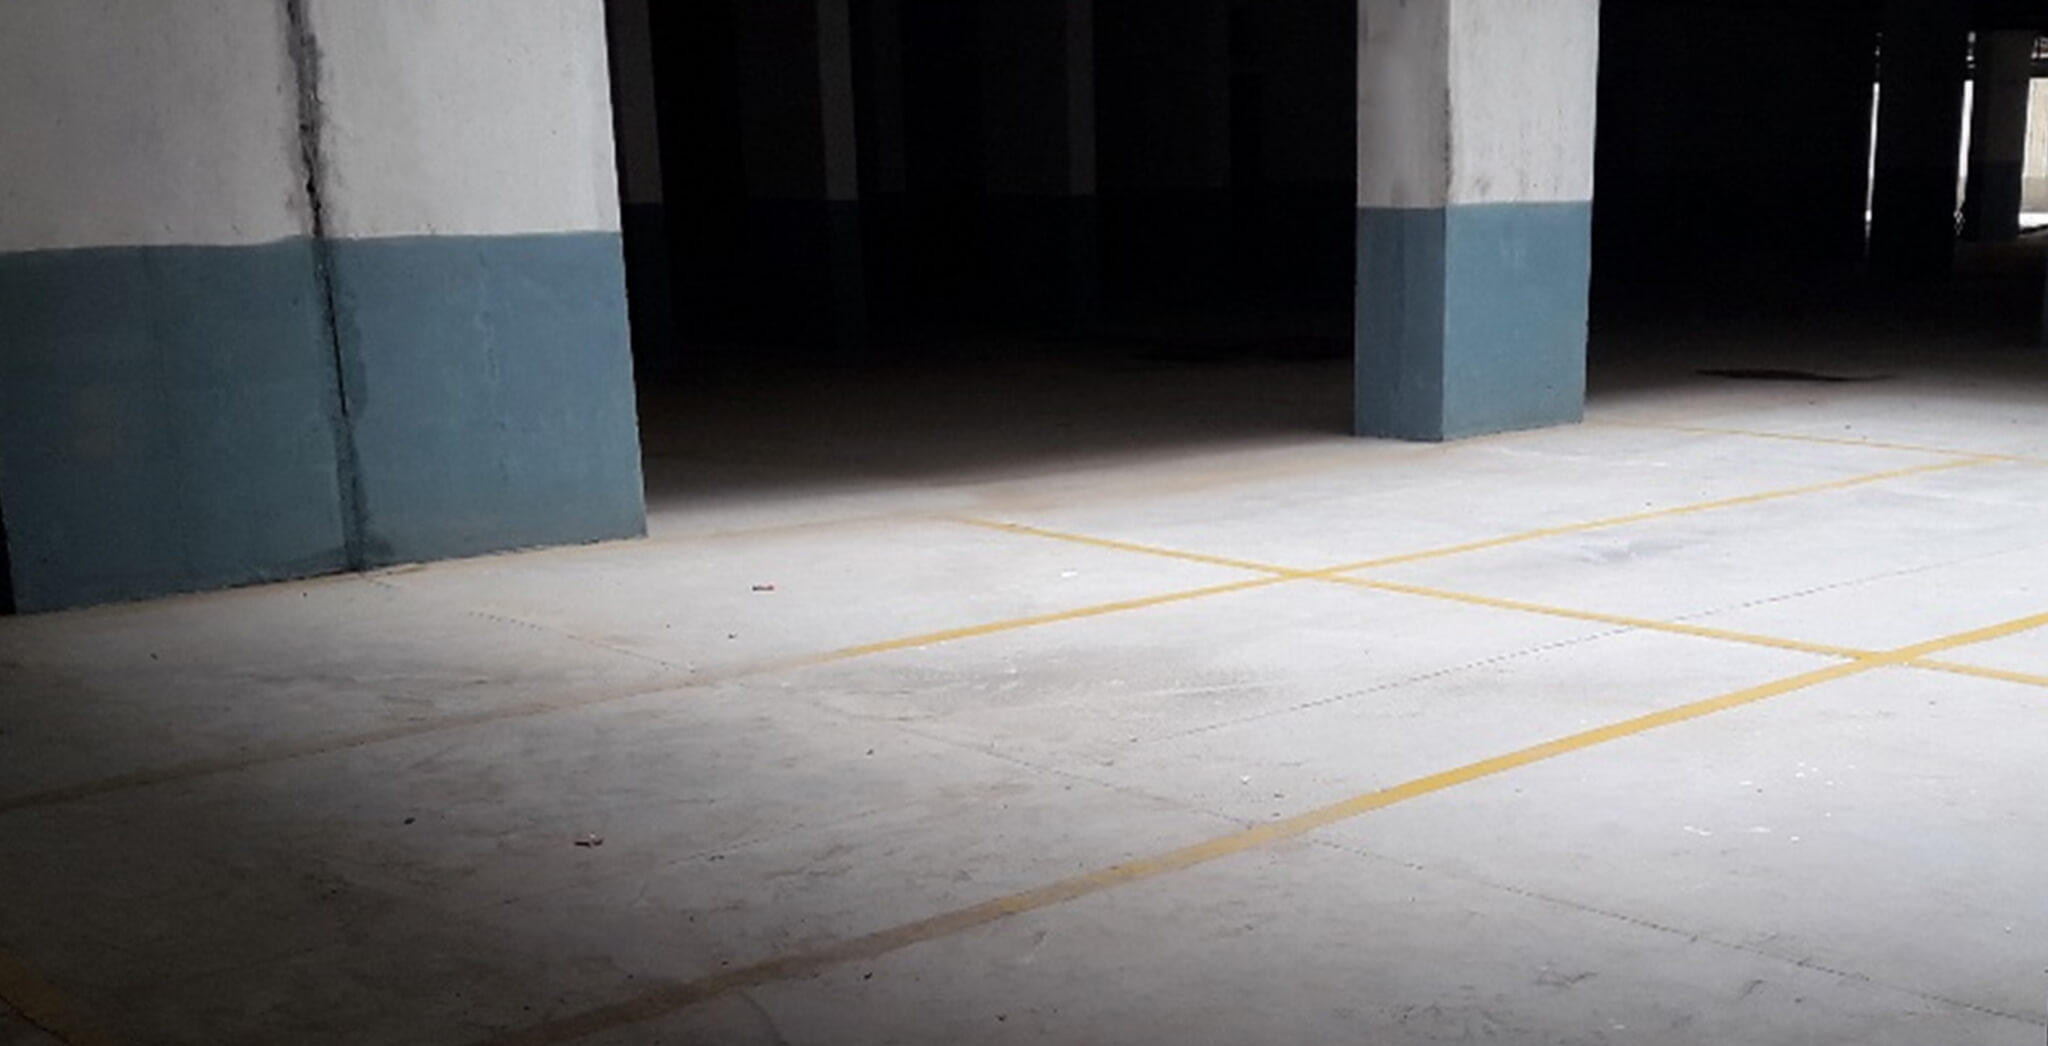 Nov 2018 - Plumeria Phase 1 basement: car park marking completed